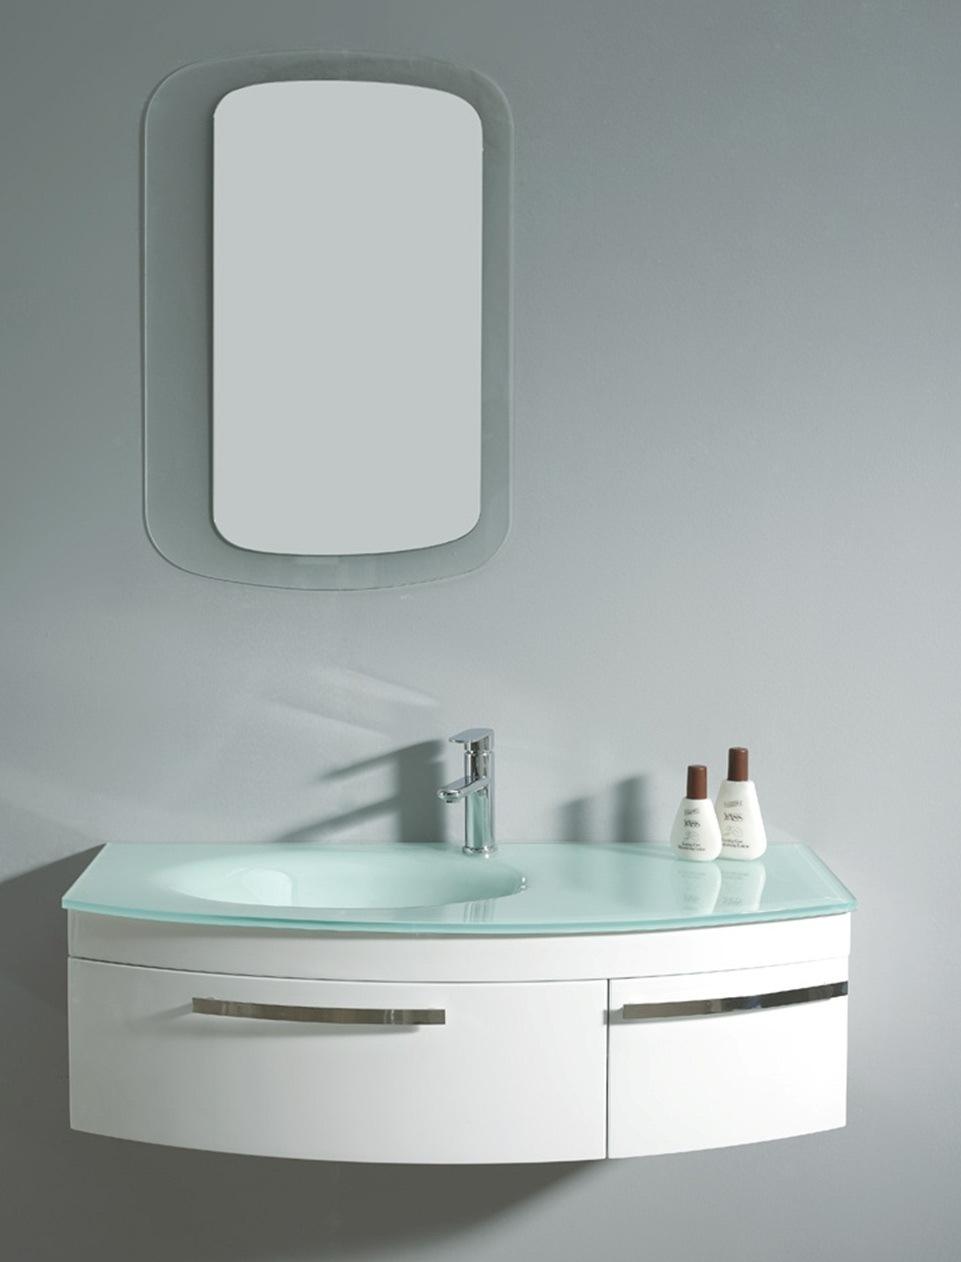 China MDF White Color Bathroom Vanity 022 1050A China Bathroom Vanity Ba